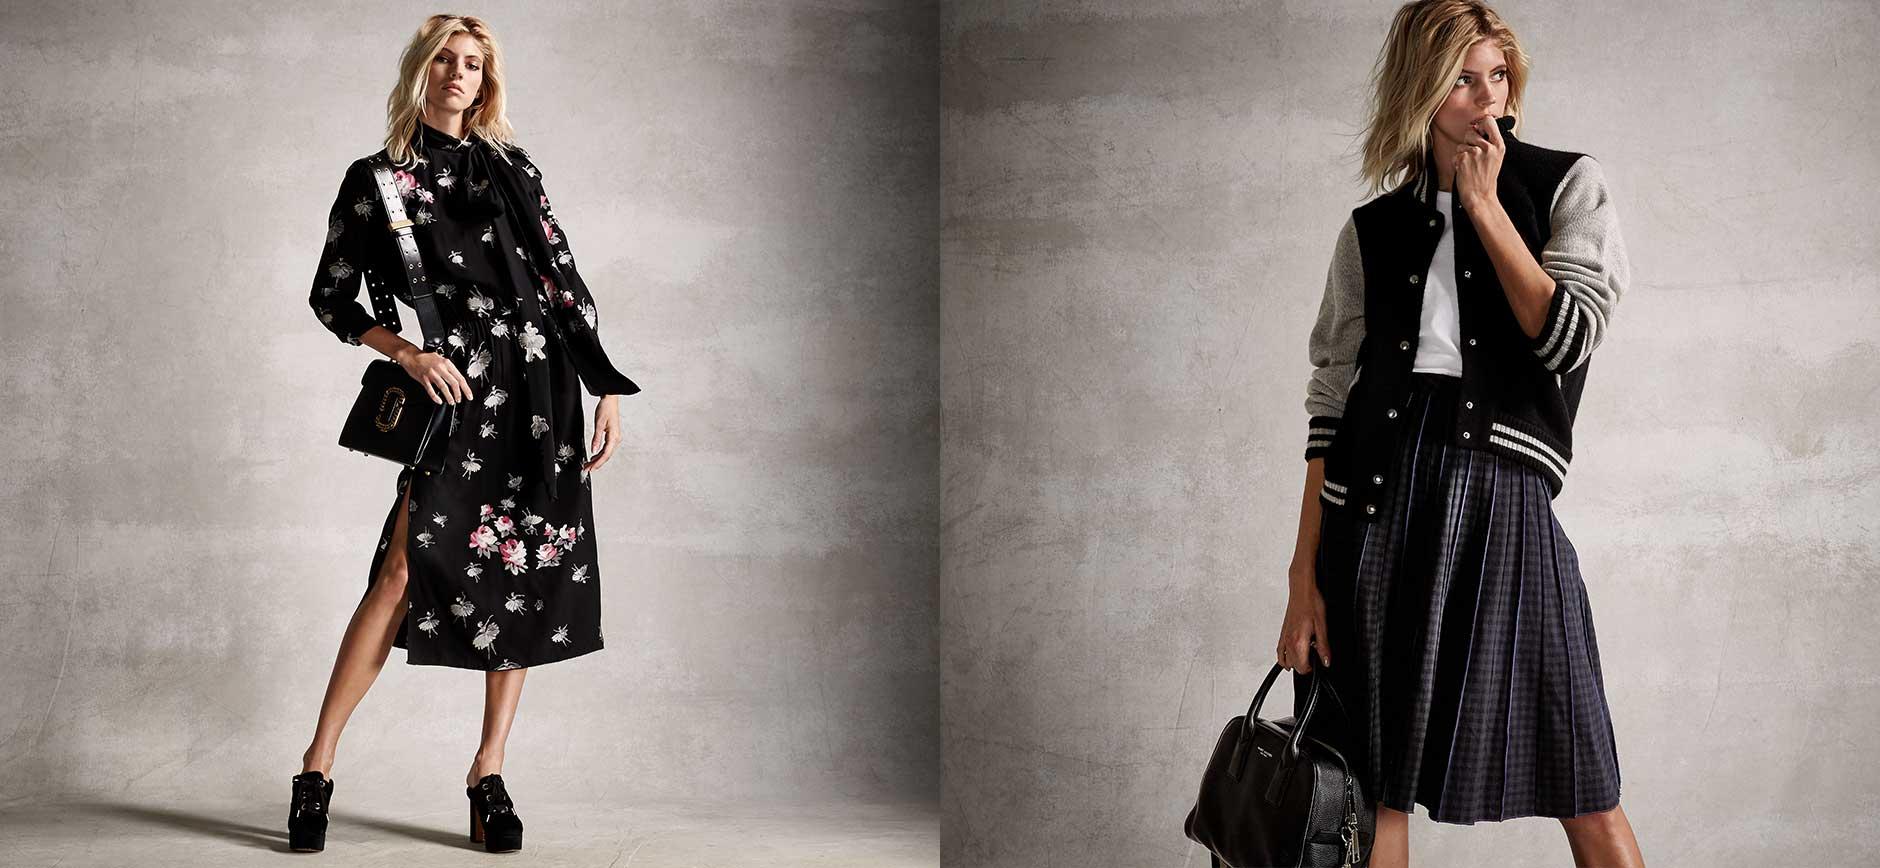 replica ysl handbag - Marc Jacobs Handbags : Tote & Shoulder Bags at Neiman Marcus